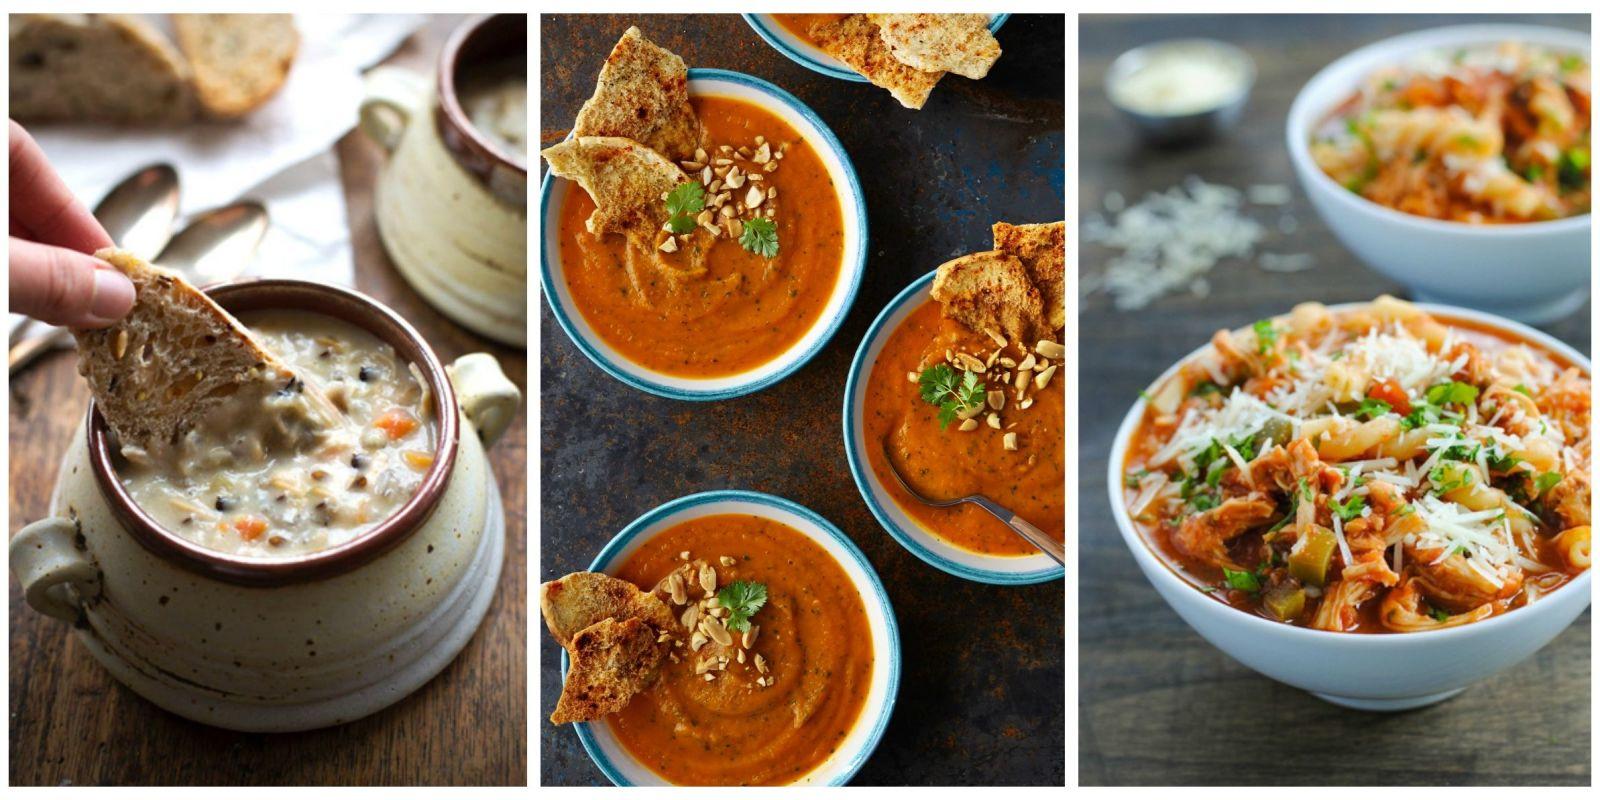 15 Slow Cooker Soup Recipes Ideas For Crockpot Soups